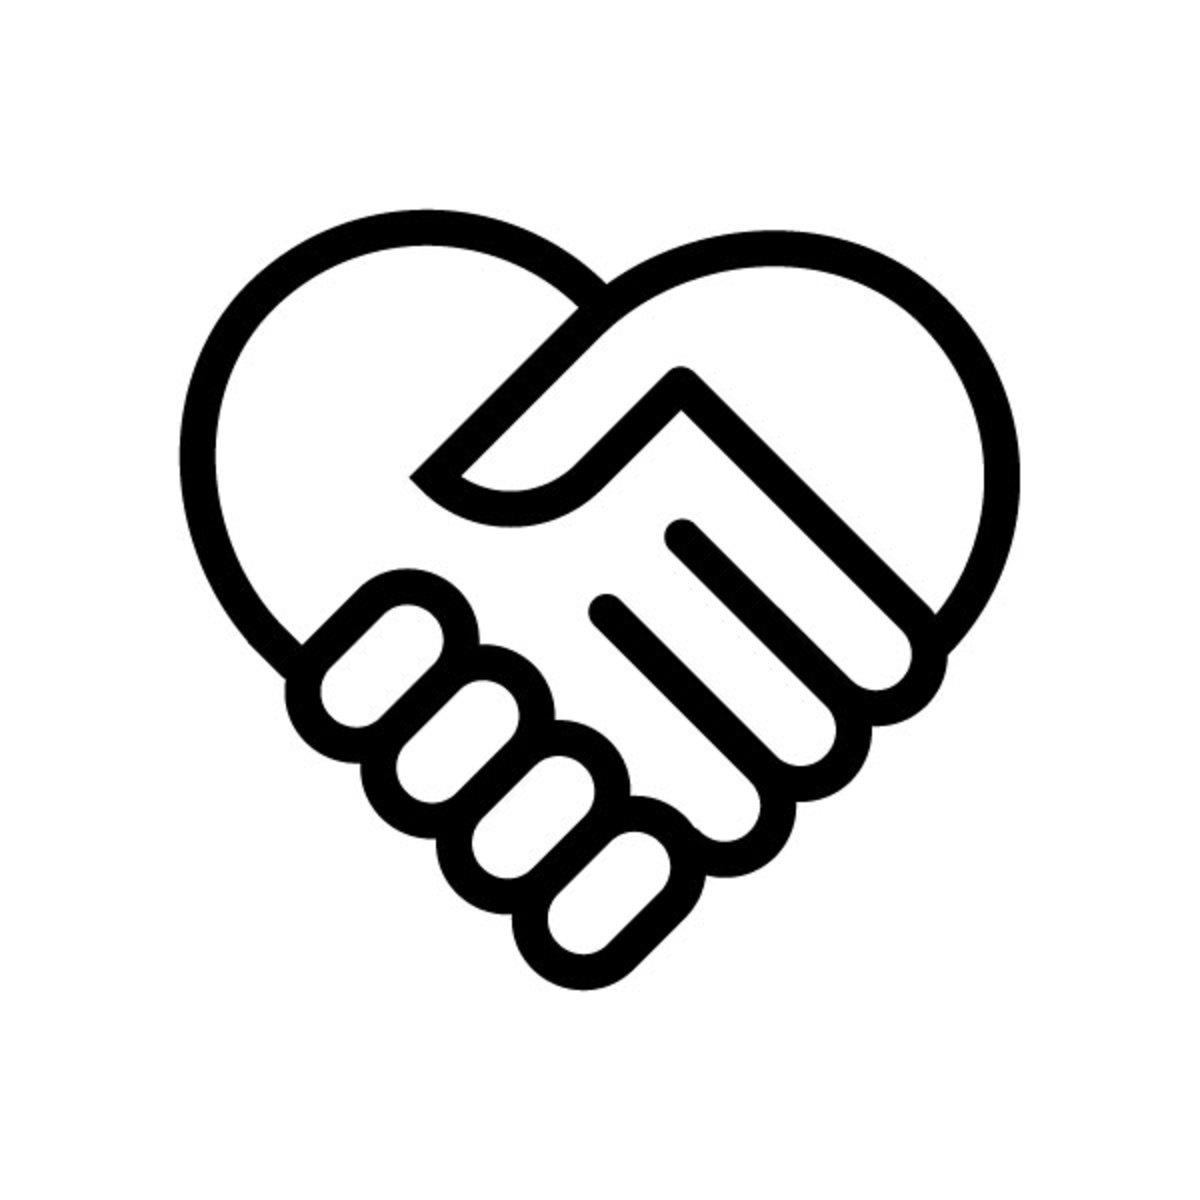 Trust Heart Handshake